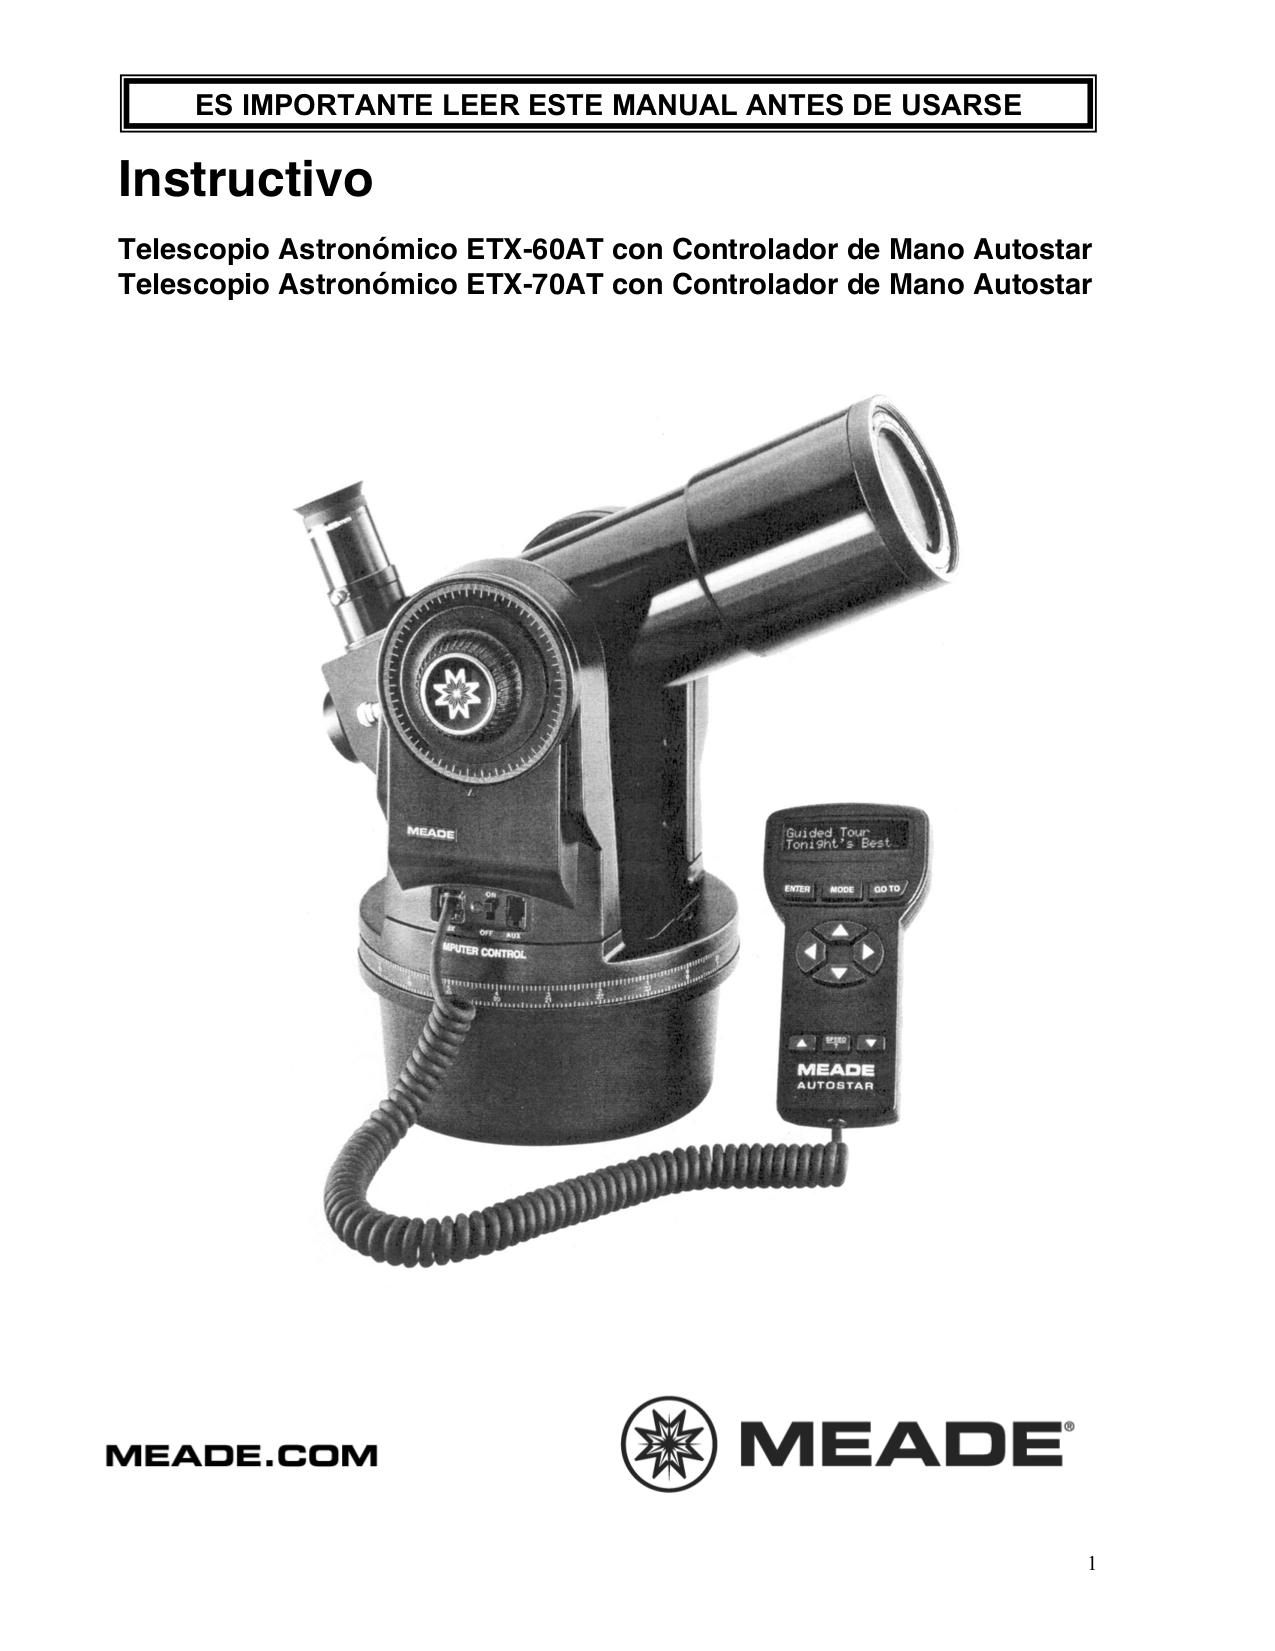 Viewfinder Repair Meade Computerized Telescopes Manual Guide